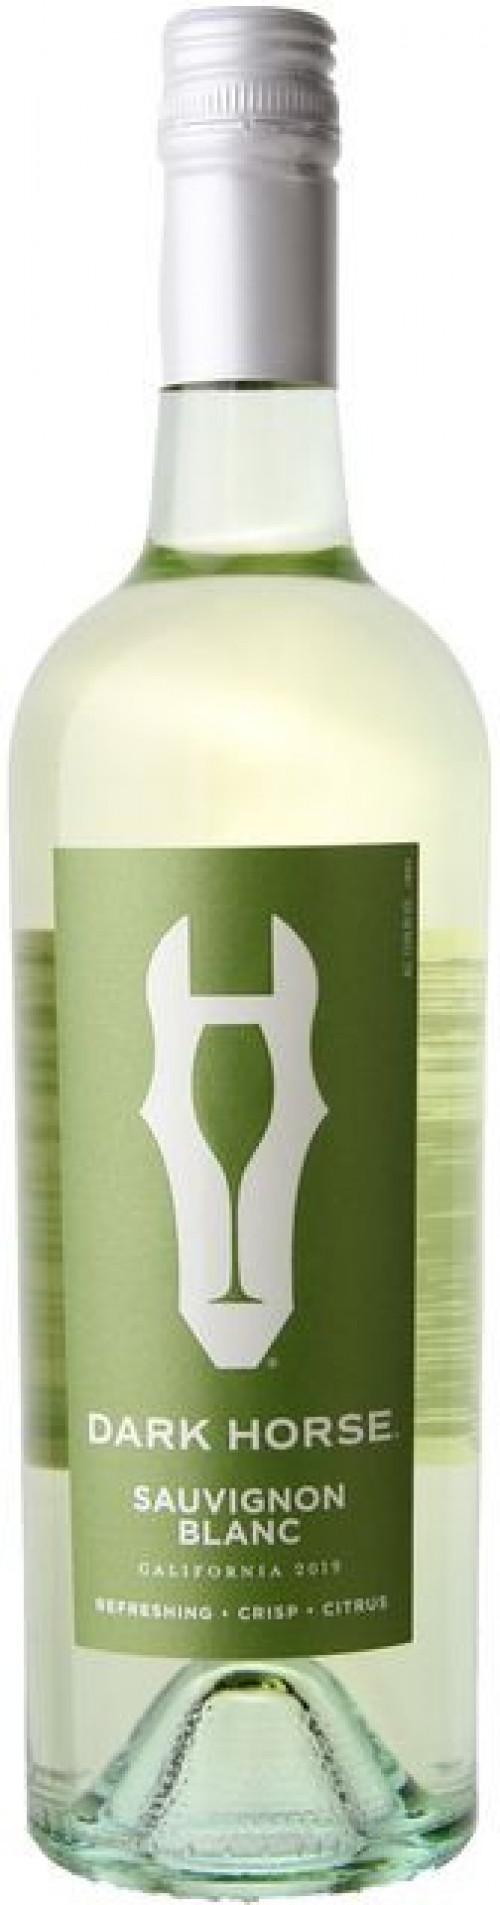 Dark Horse Sauvignon Blanc 750ml